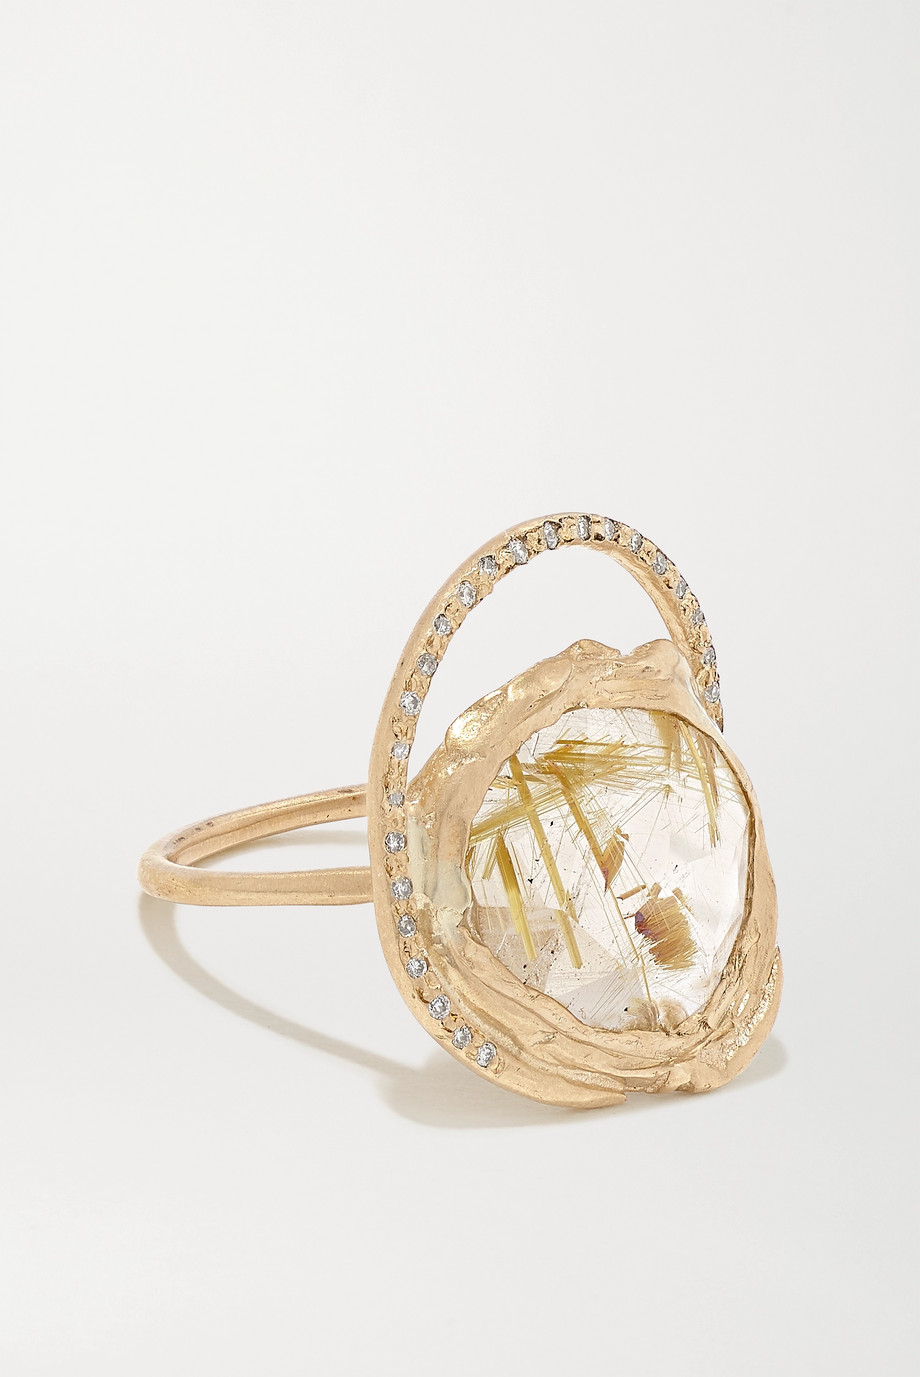 Pascale Monvoisin Gaia 9-karat gold, quartz and diamond ring